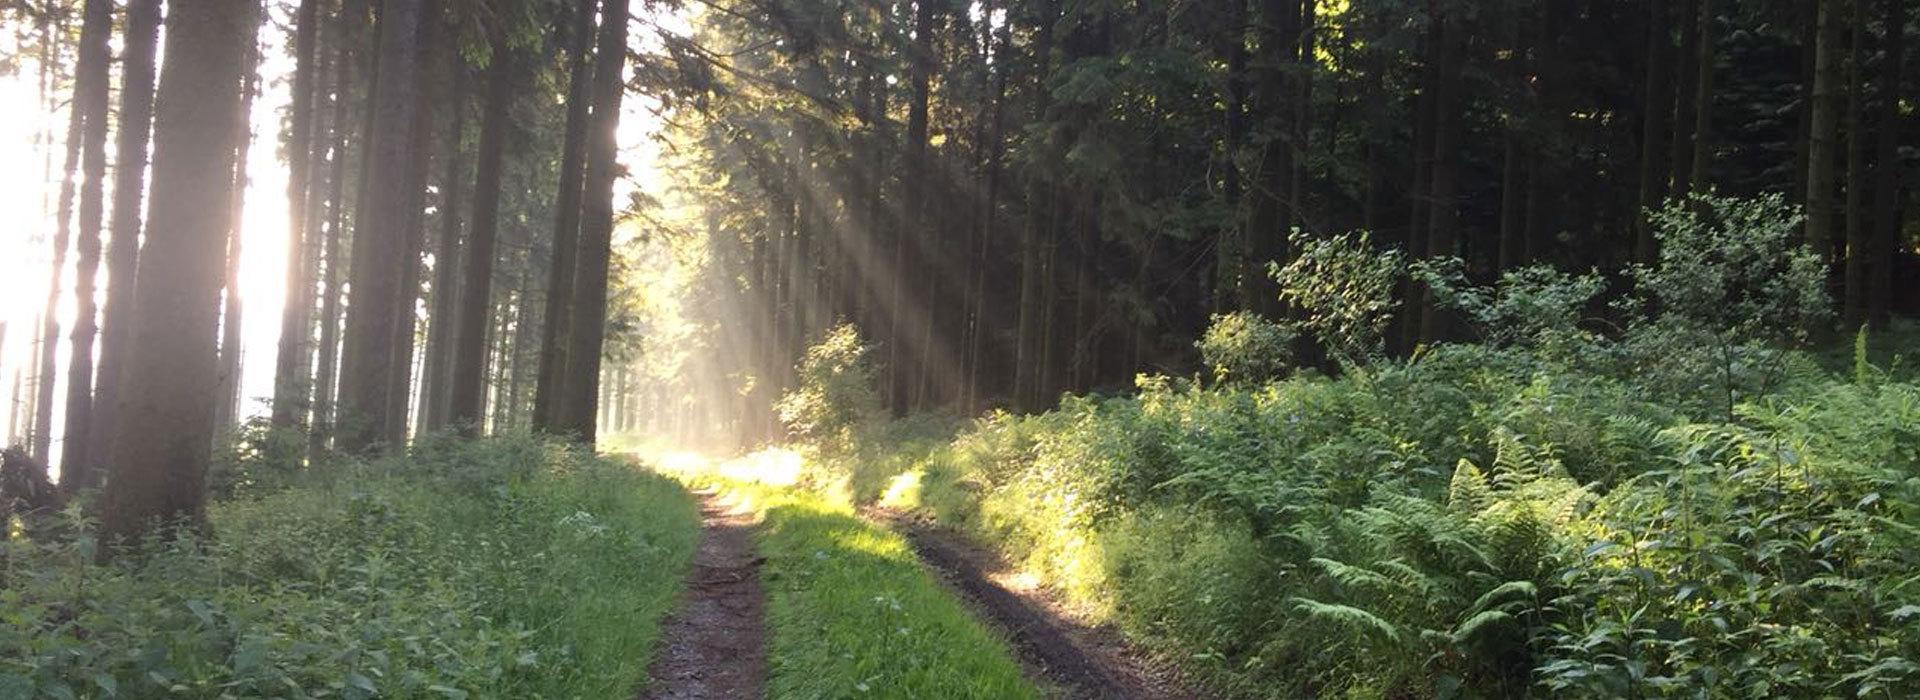 Verkehrssicherung-Waldwege